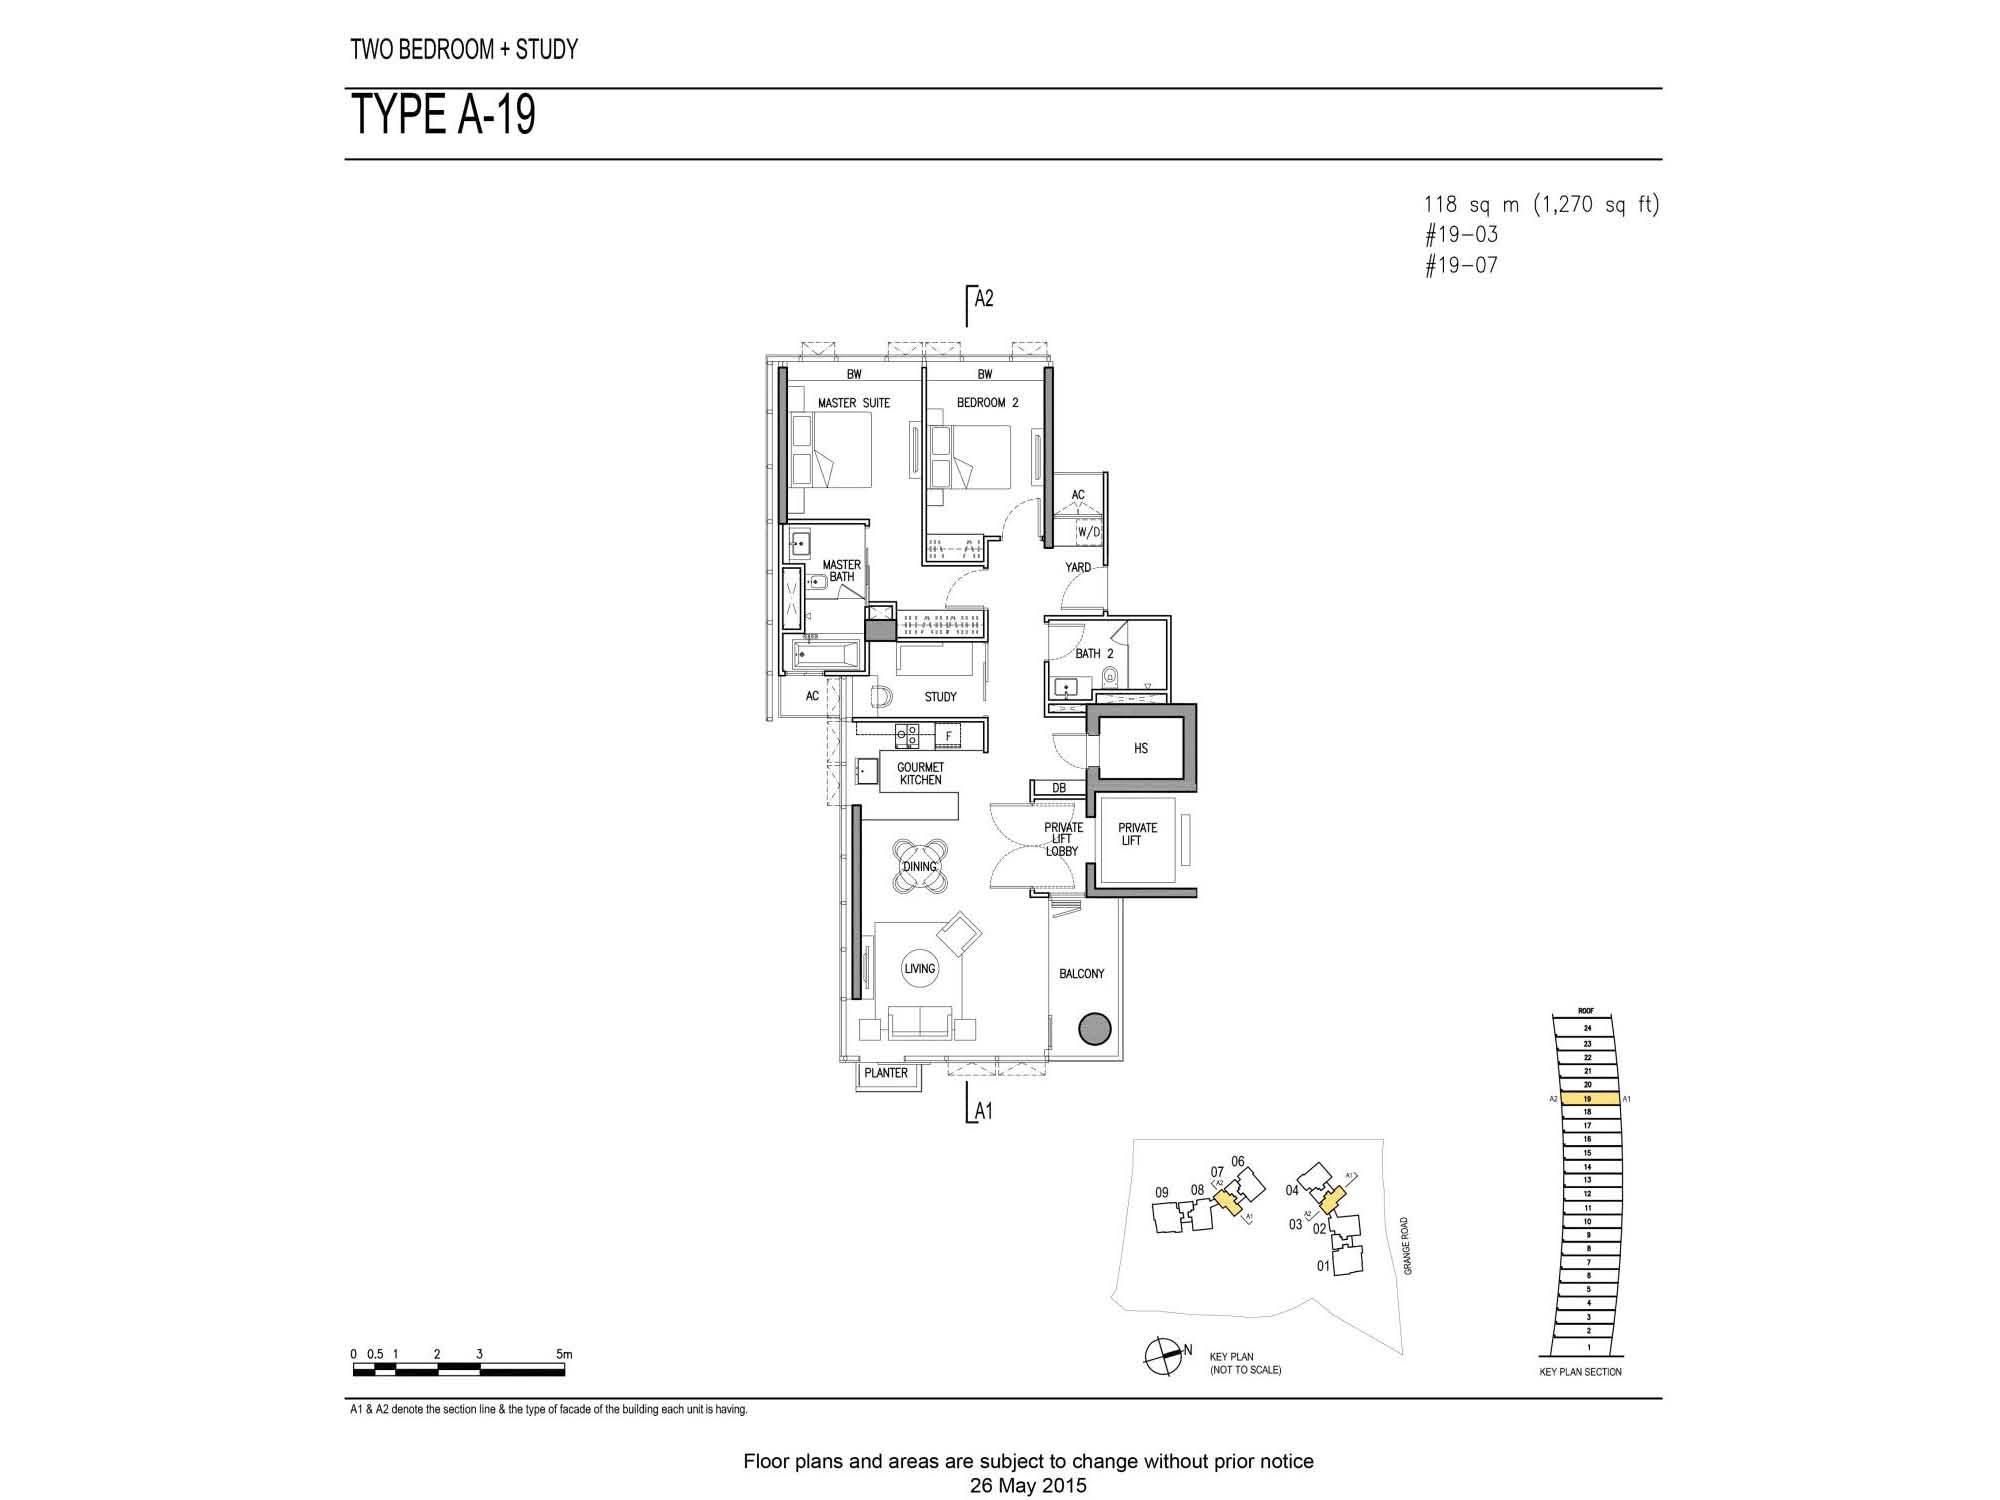 2+Study Type A-5